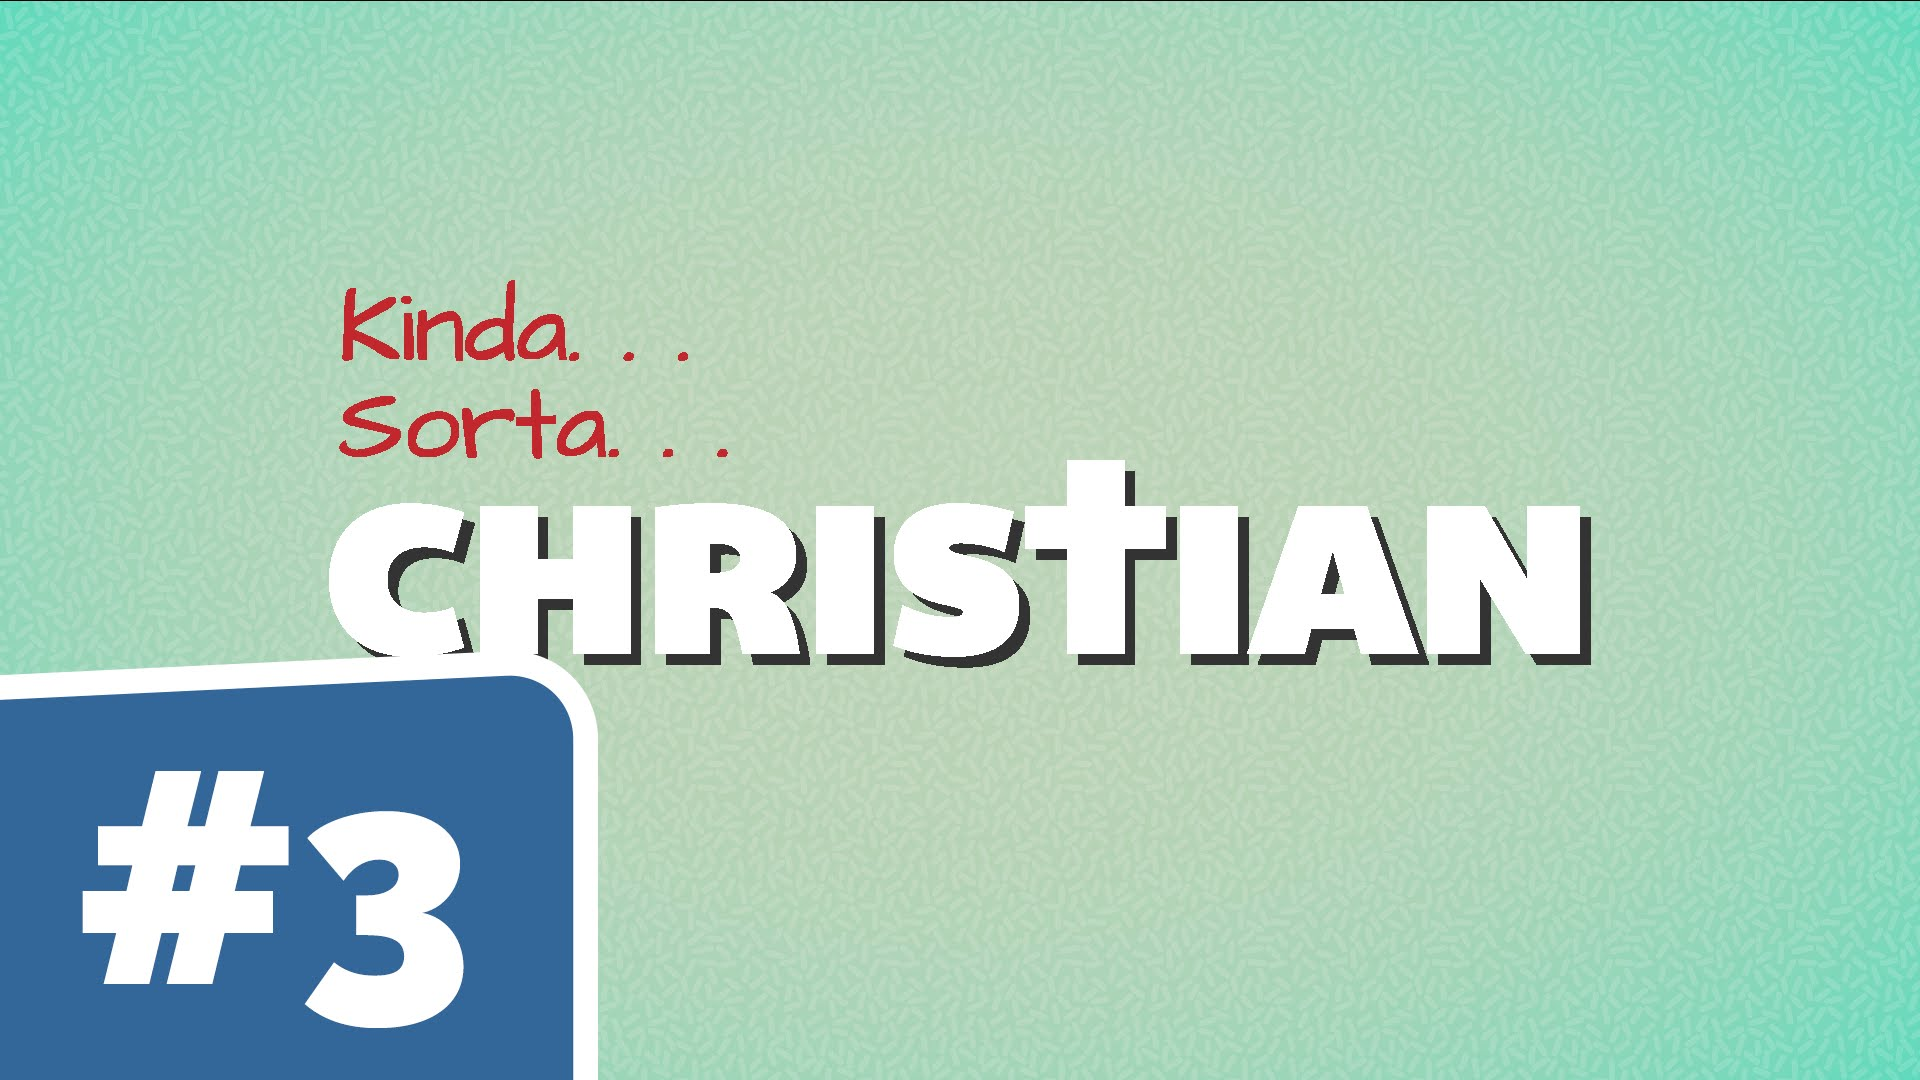 Kinda Sorta Christian: Don't Ask Me to Share My Faith (Students)